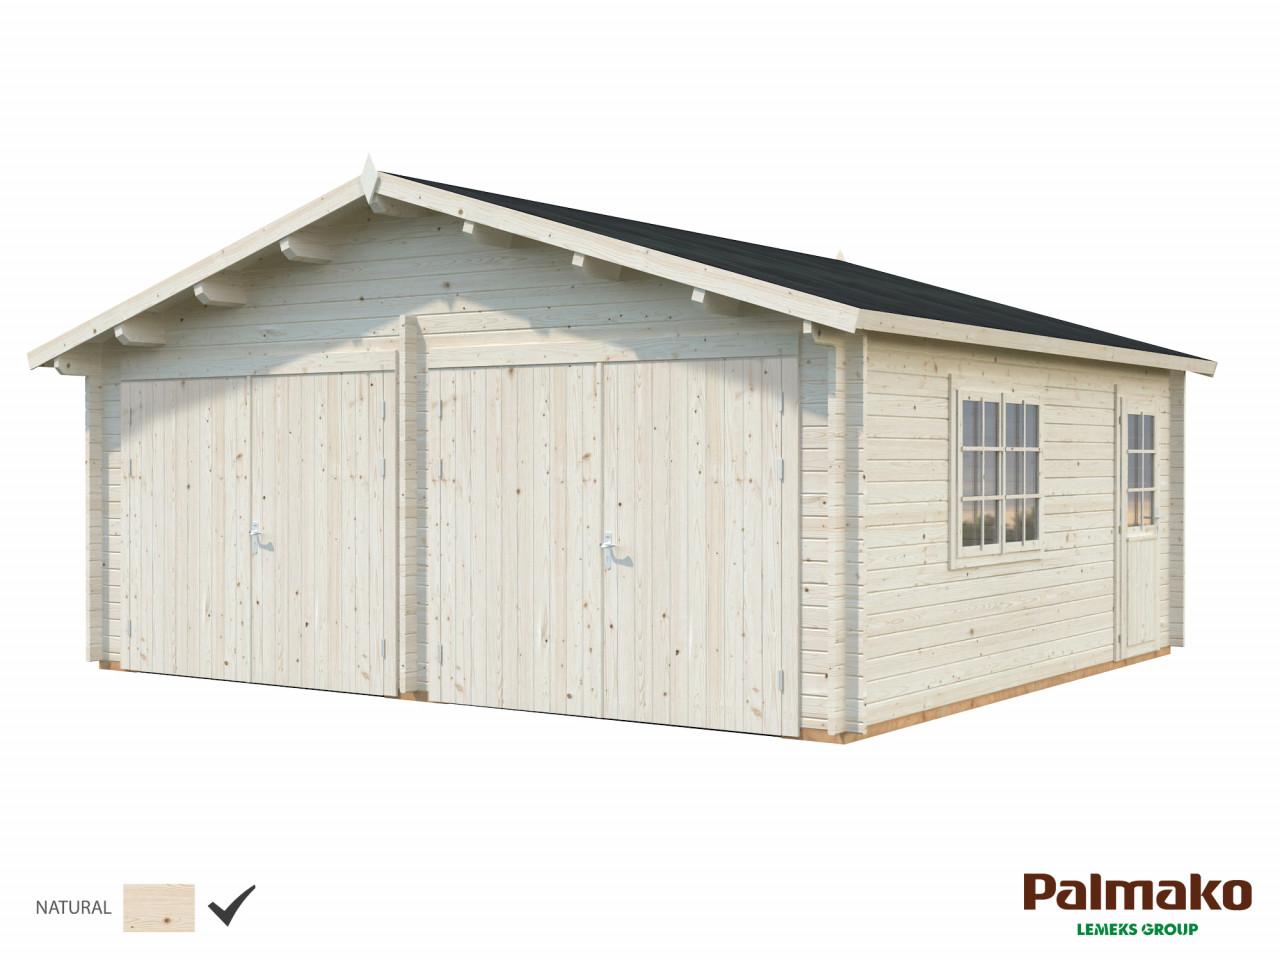 Palmako Holzgarage Roger 28,4 m² mit Holztor